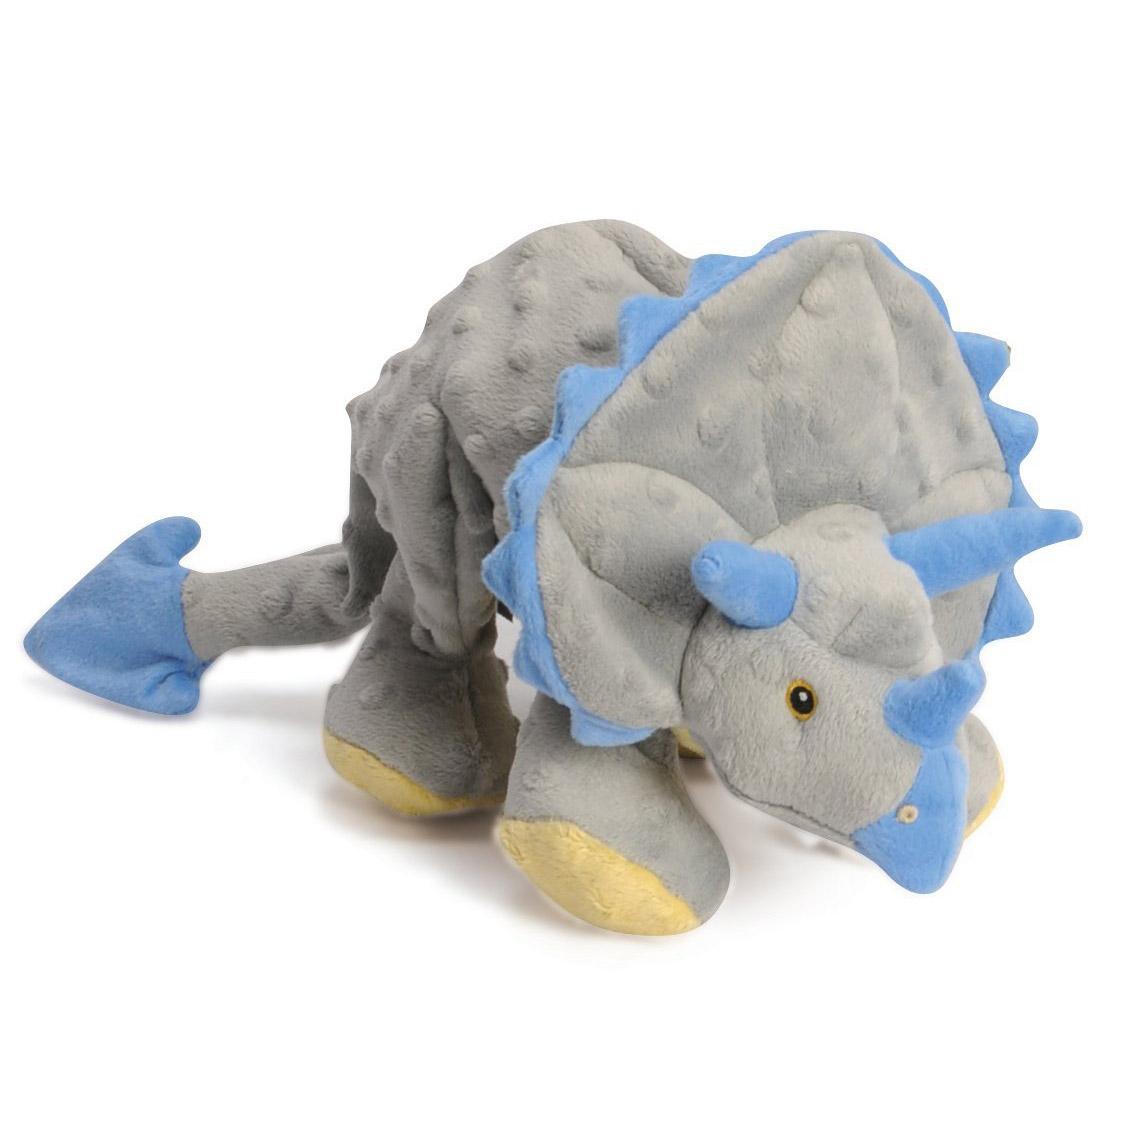 goDog Dinos Chew Guard Frills Triceratops Dog Toy - Gray